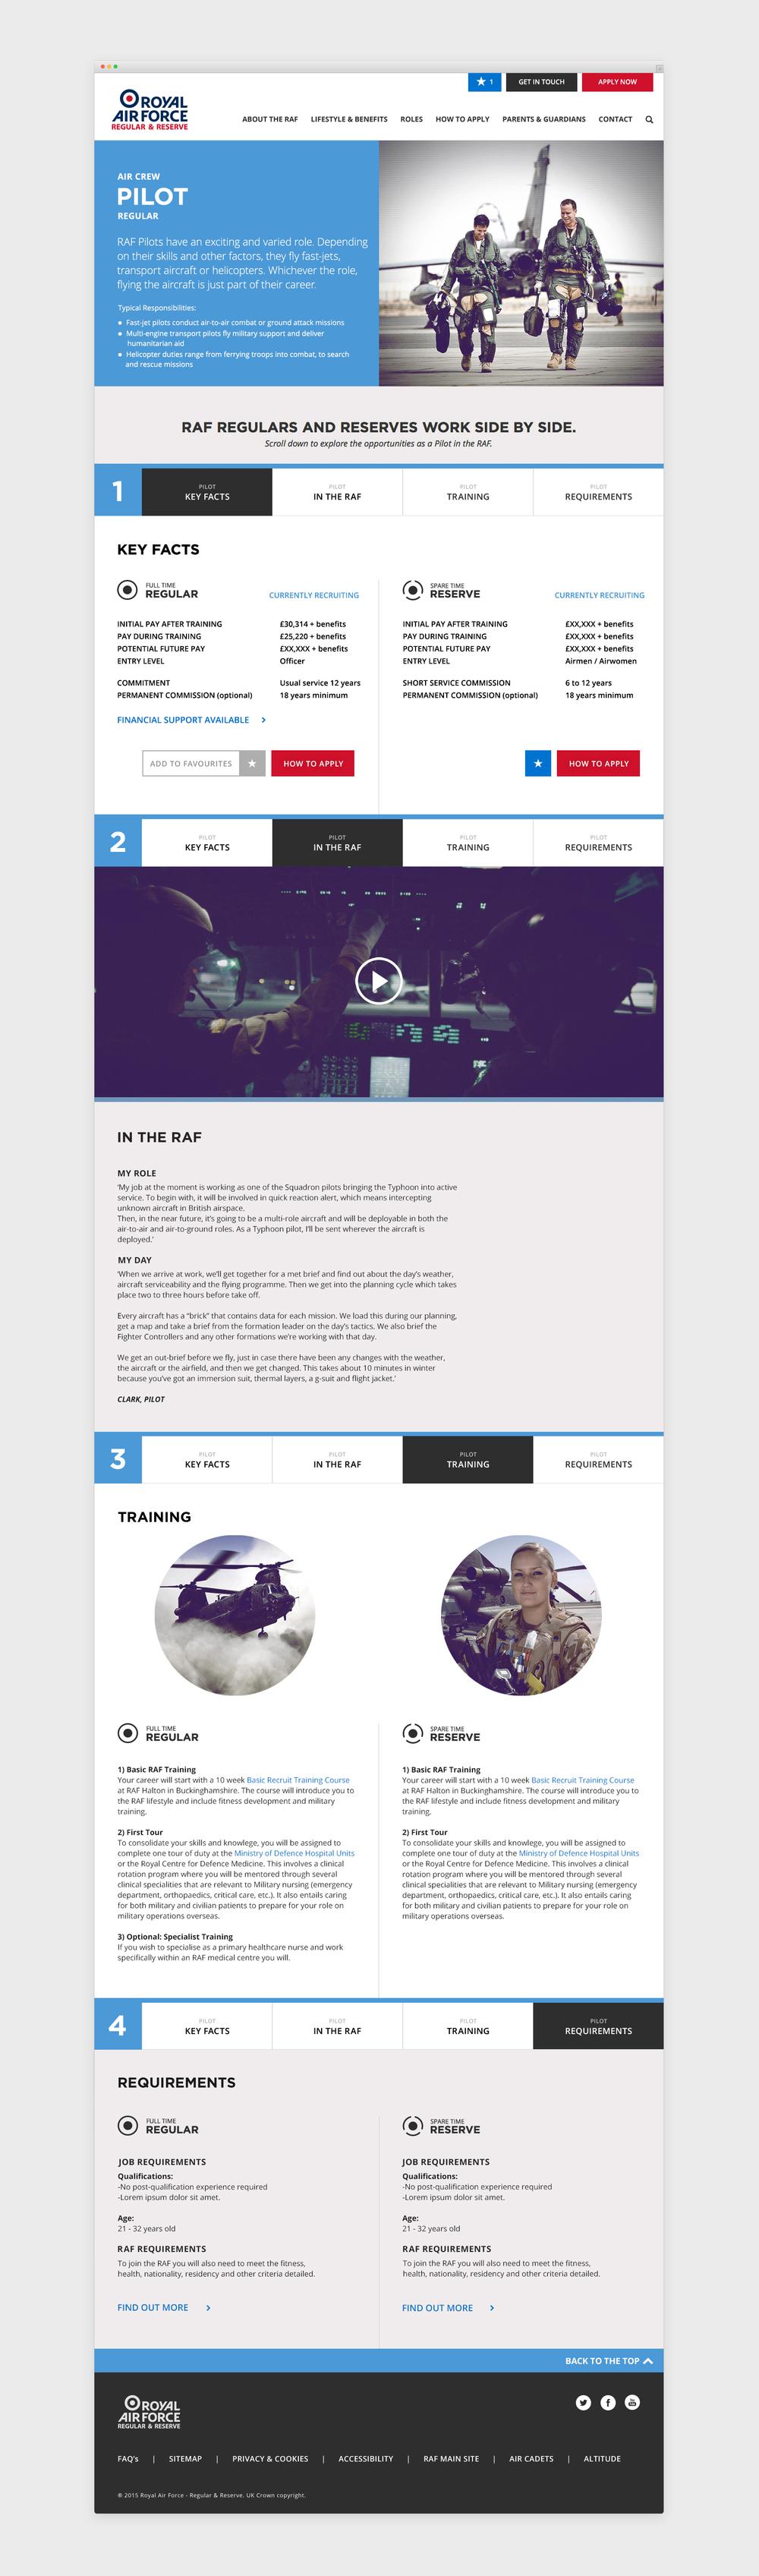 MANURIDOCCI_Browser_fullbleed_RAF_pilot.jpg